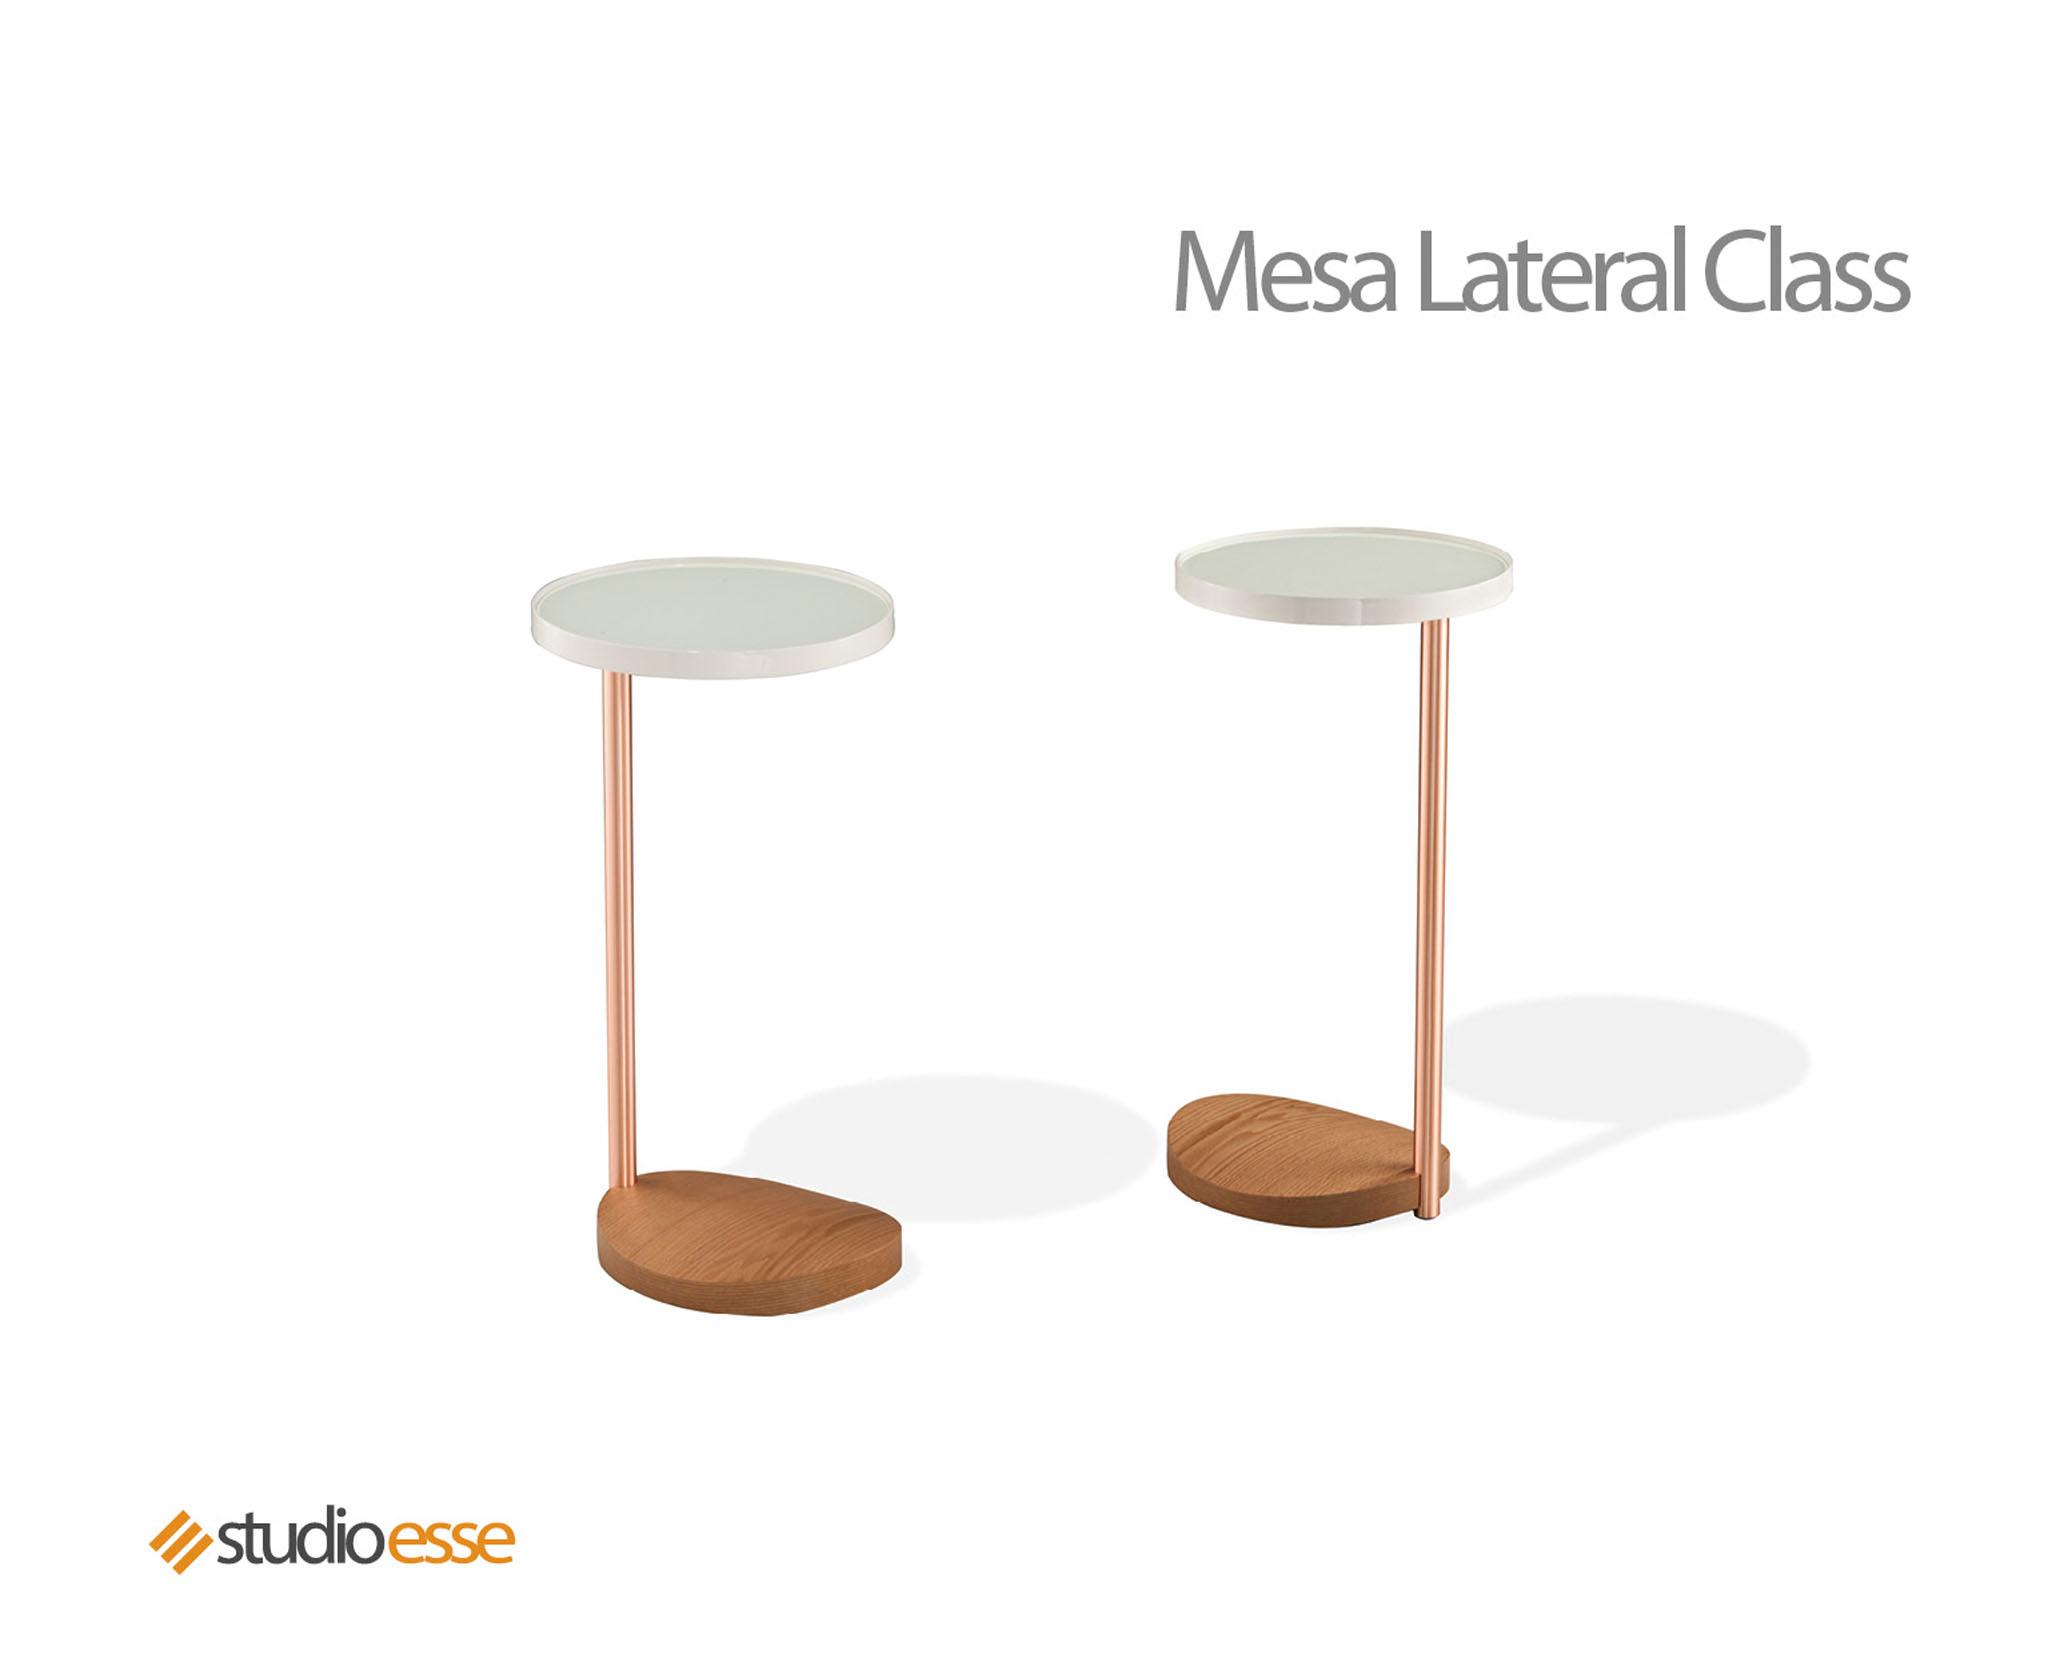 Essenza_Mesa Lateral_10_mesalateral_class_1.jpg